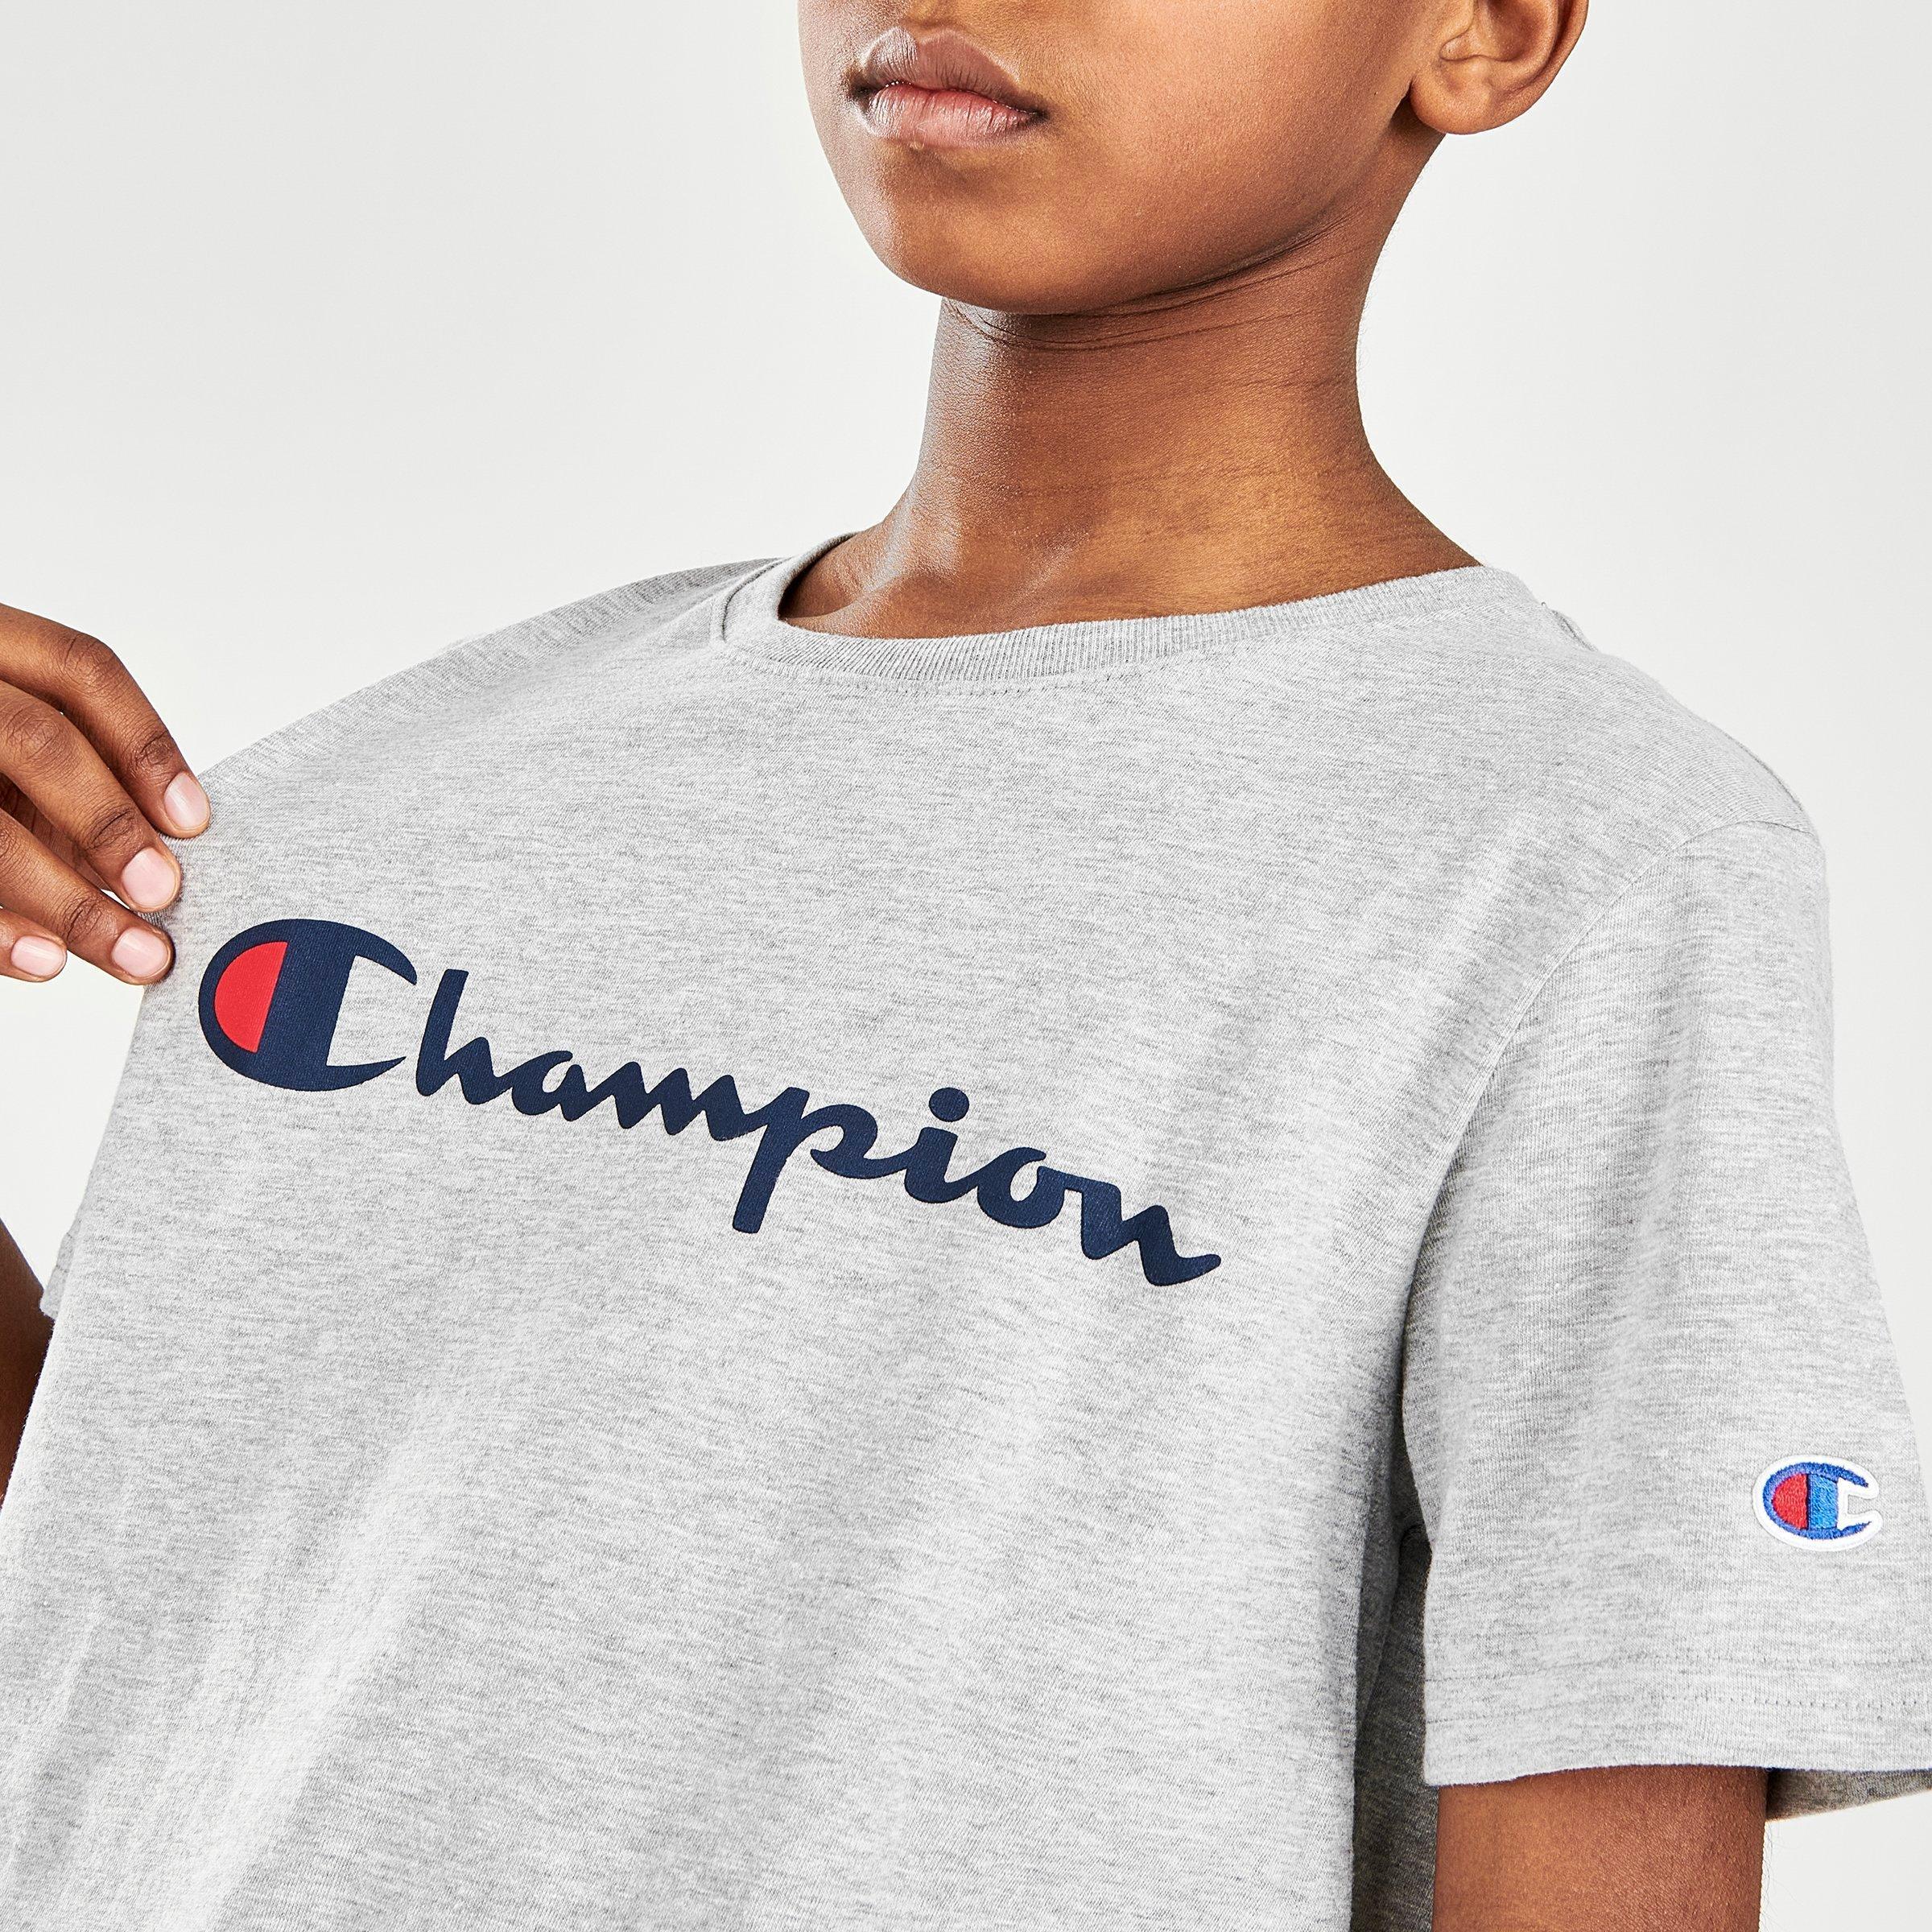 CHAMPION BOYS AOP SHIRT SIZE  4 5 6 NEW!